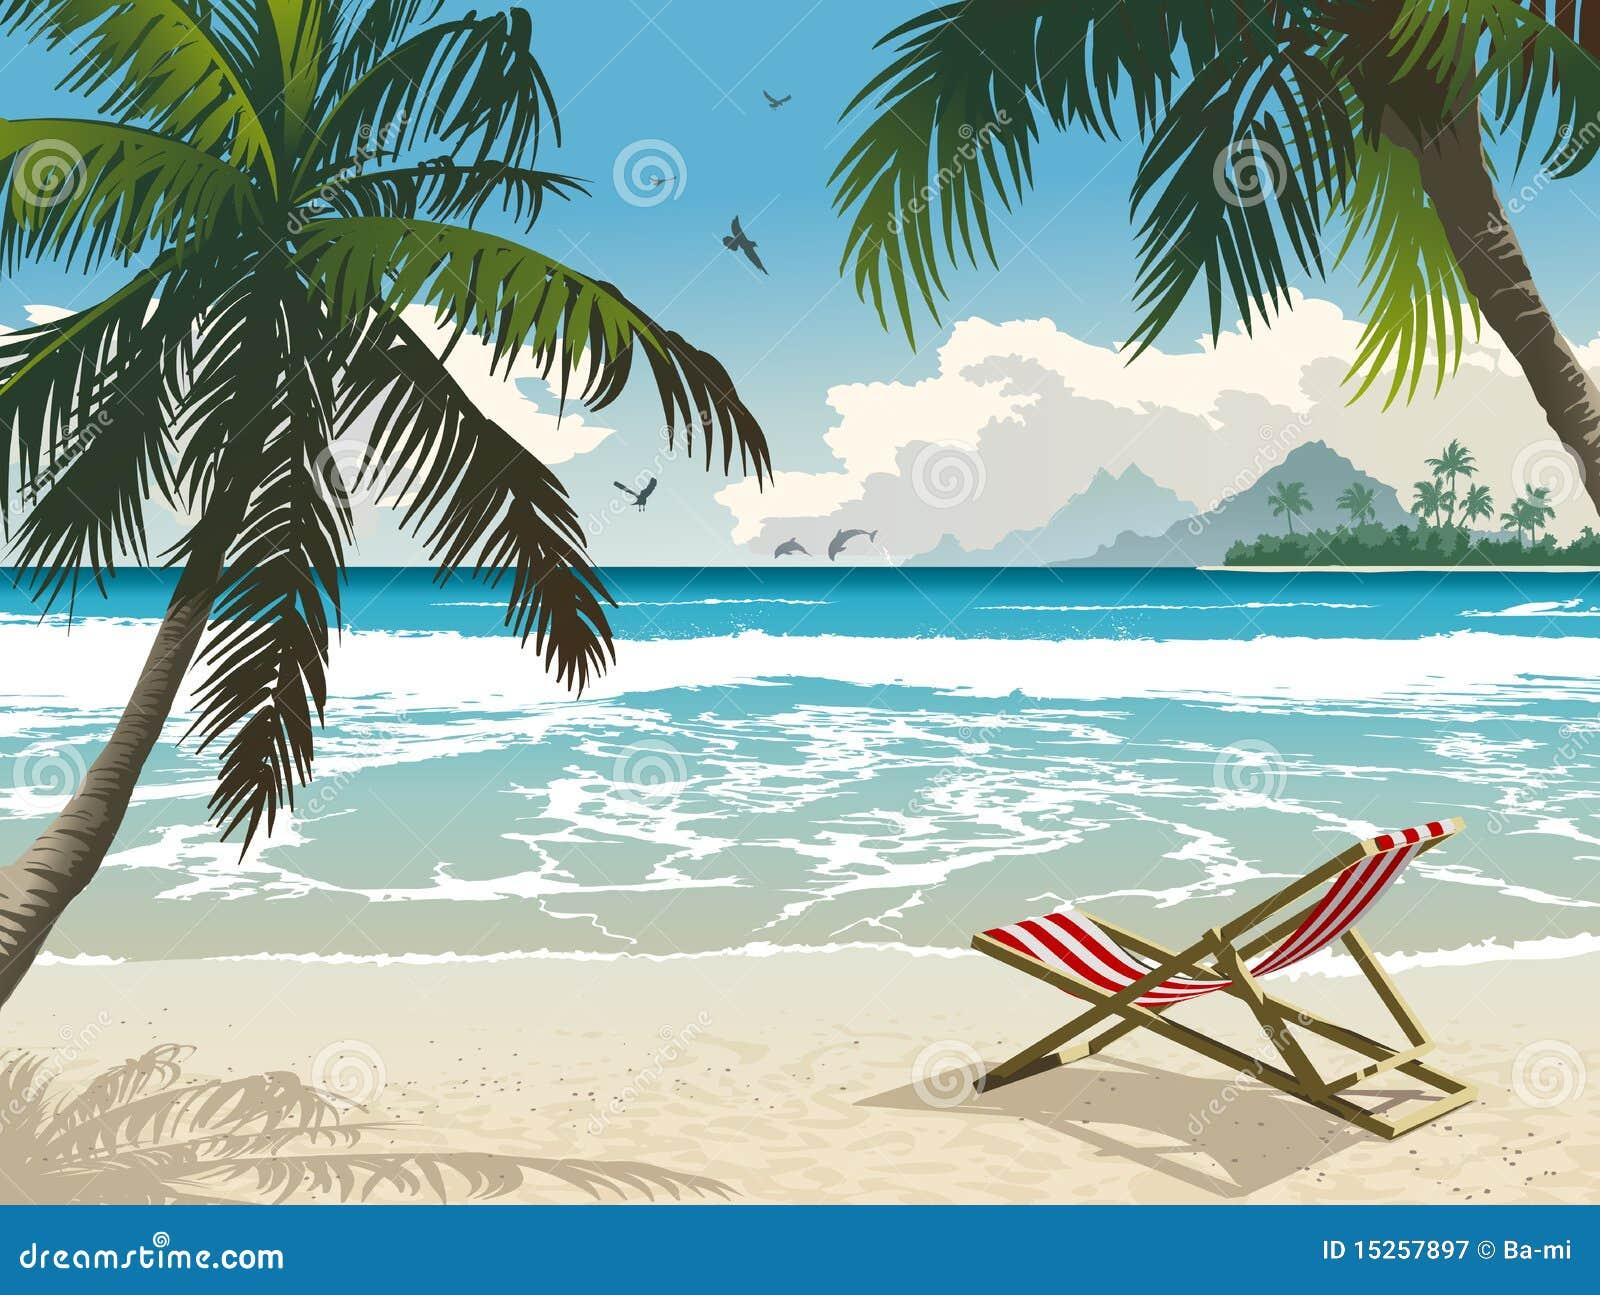 stock image of hawaiian - photo #10